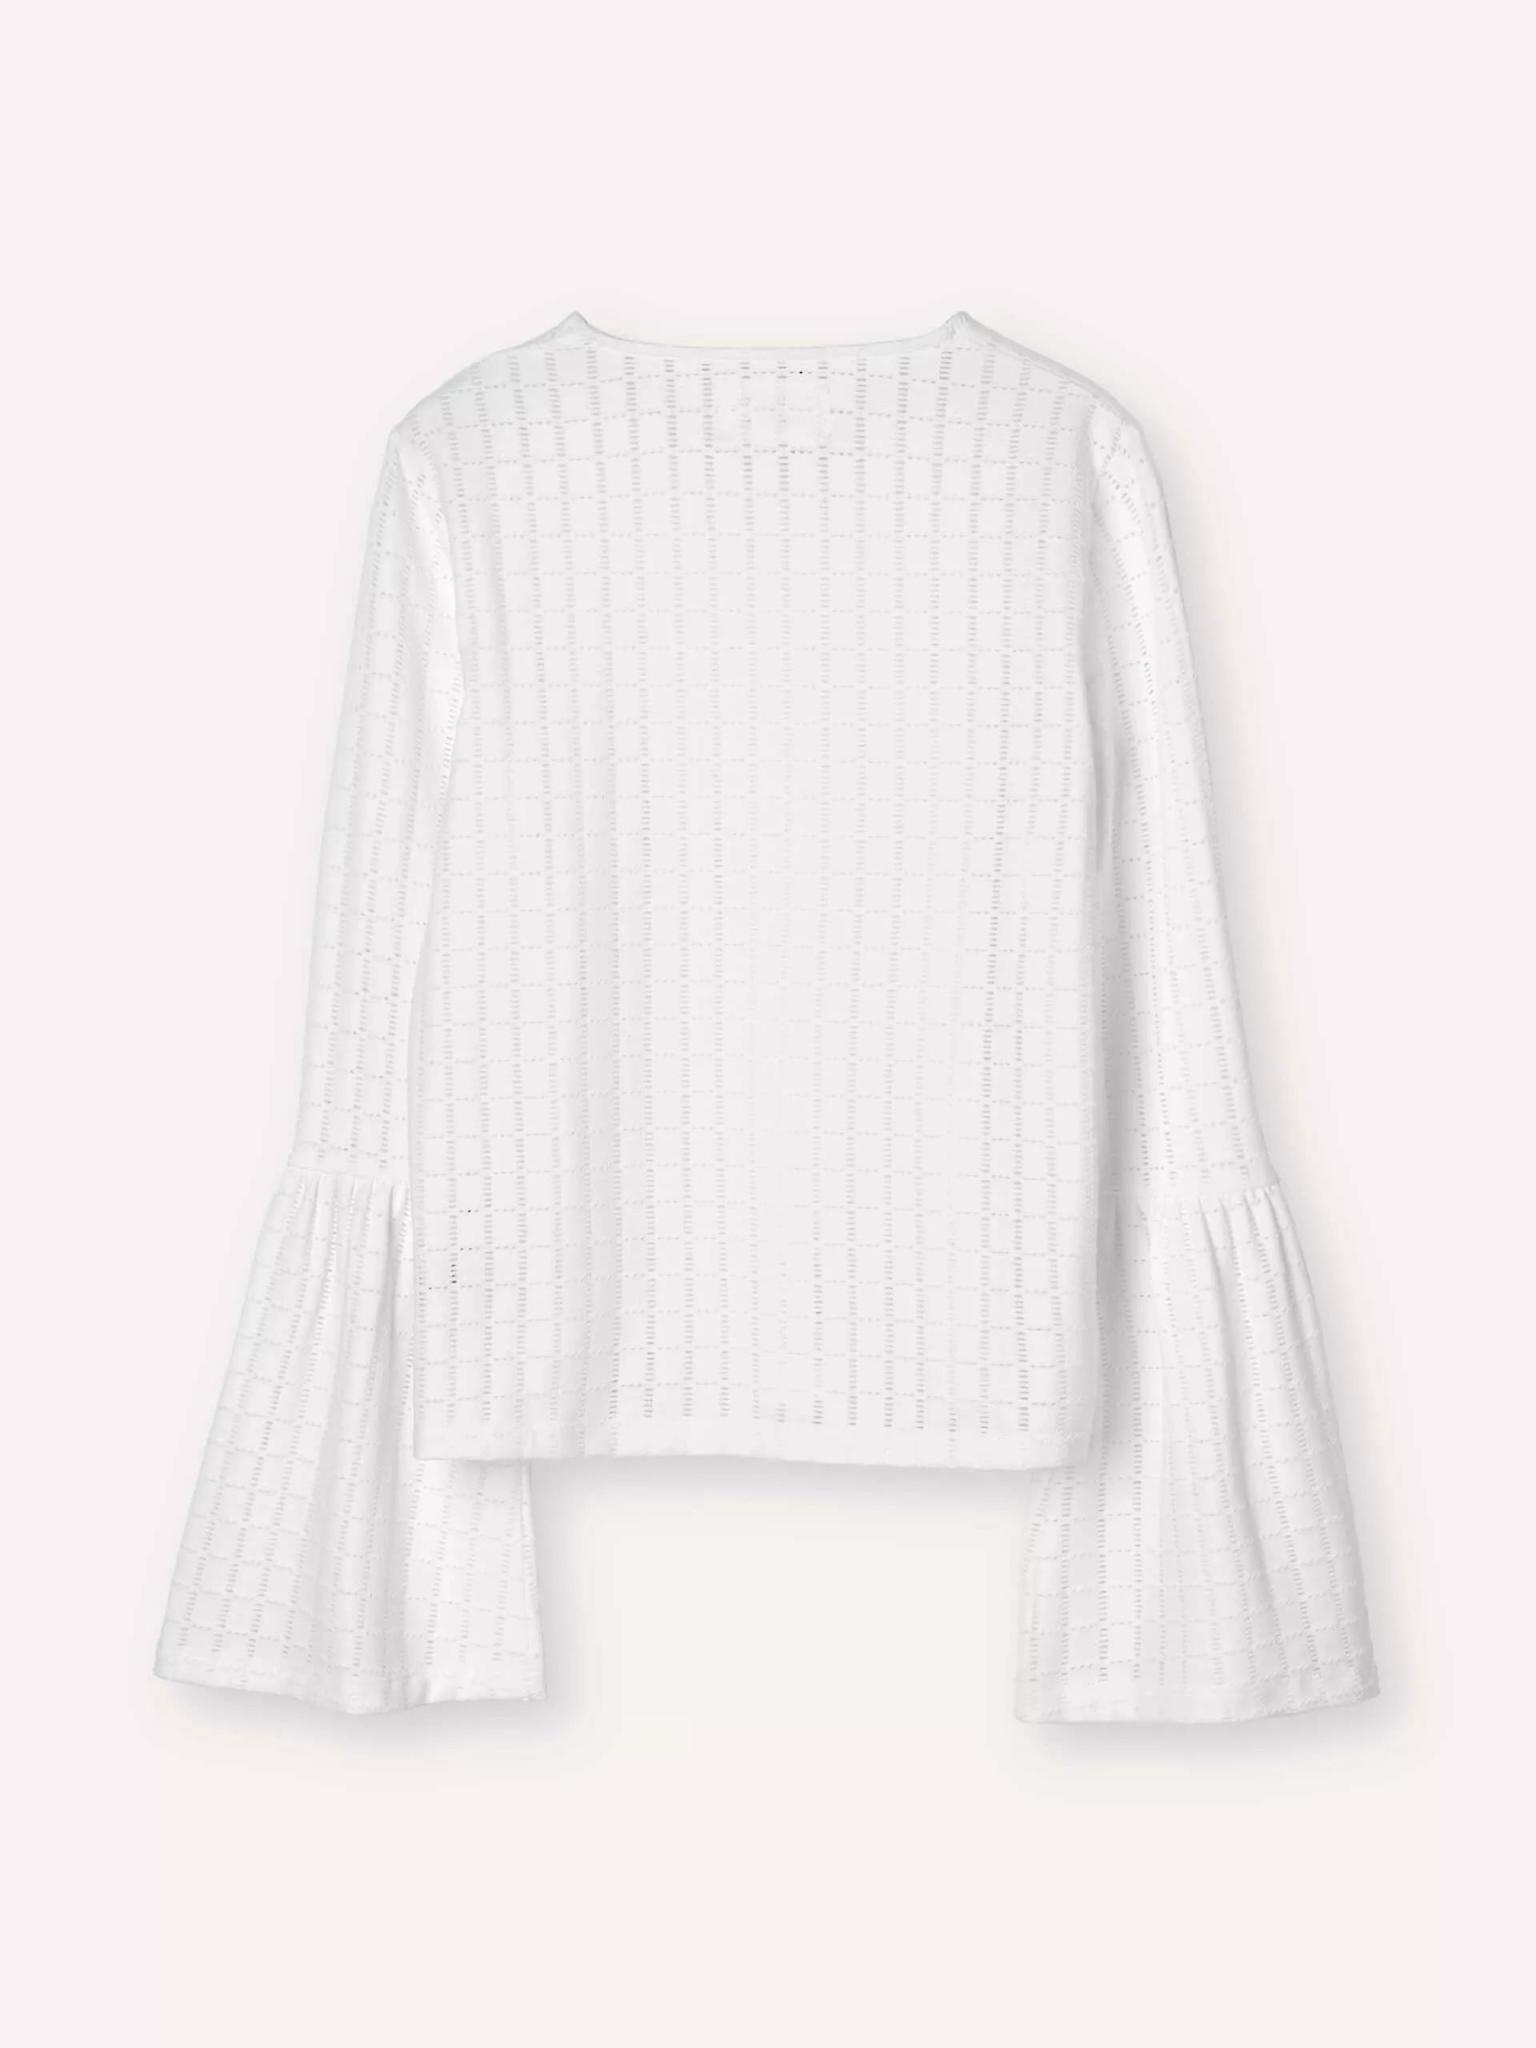 Radar Embroidery Top Bright White-2